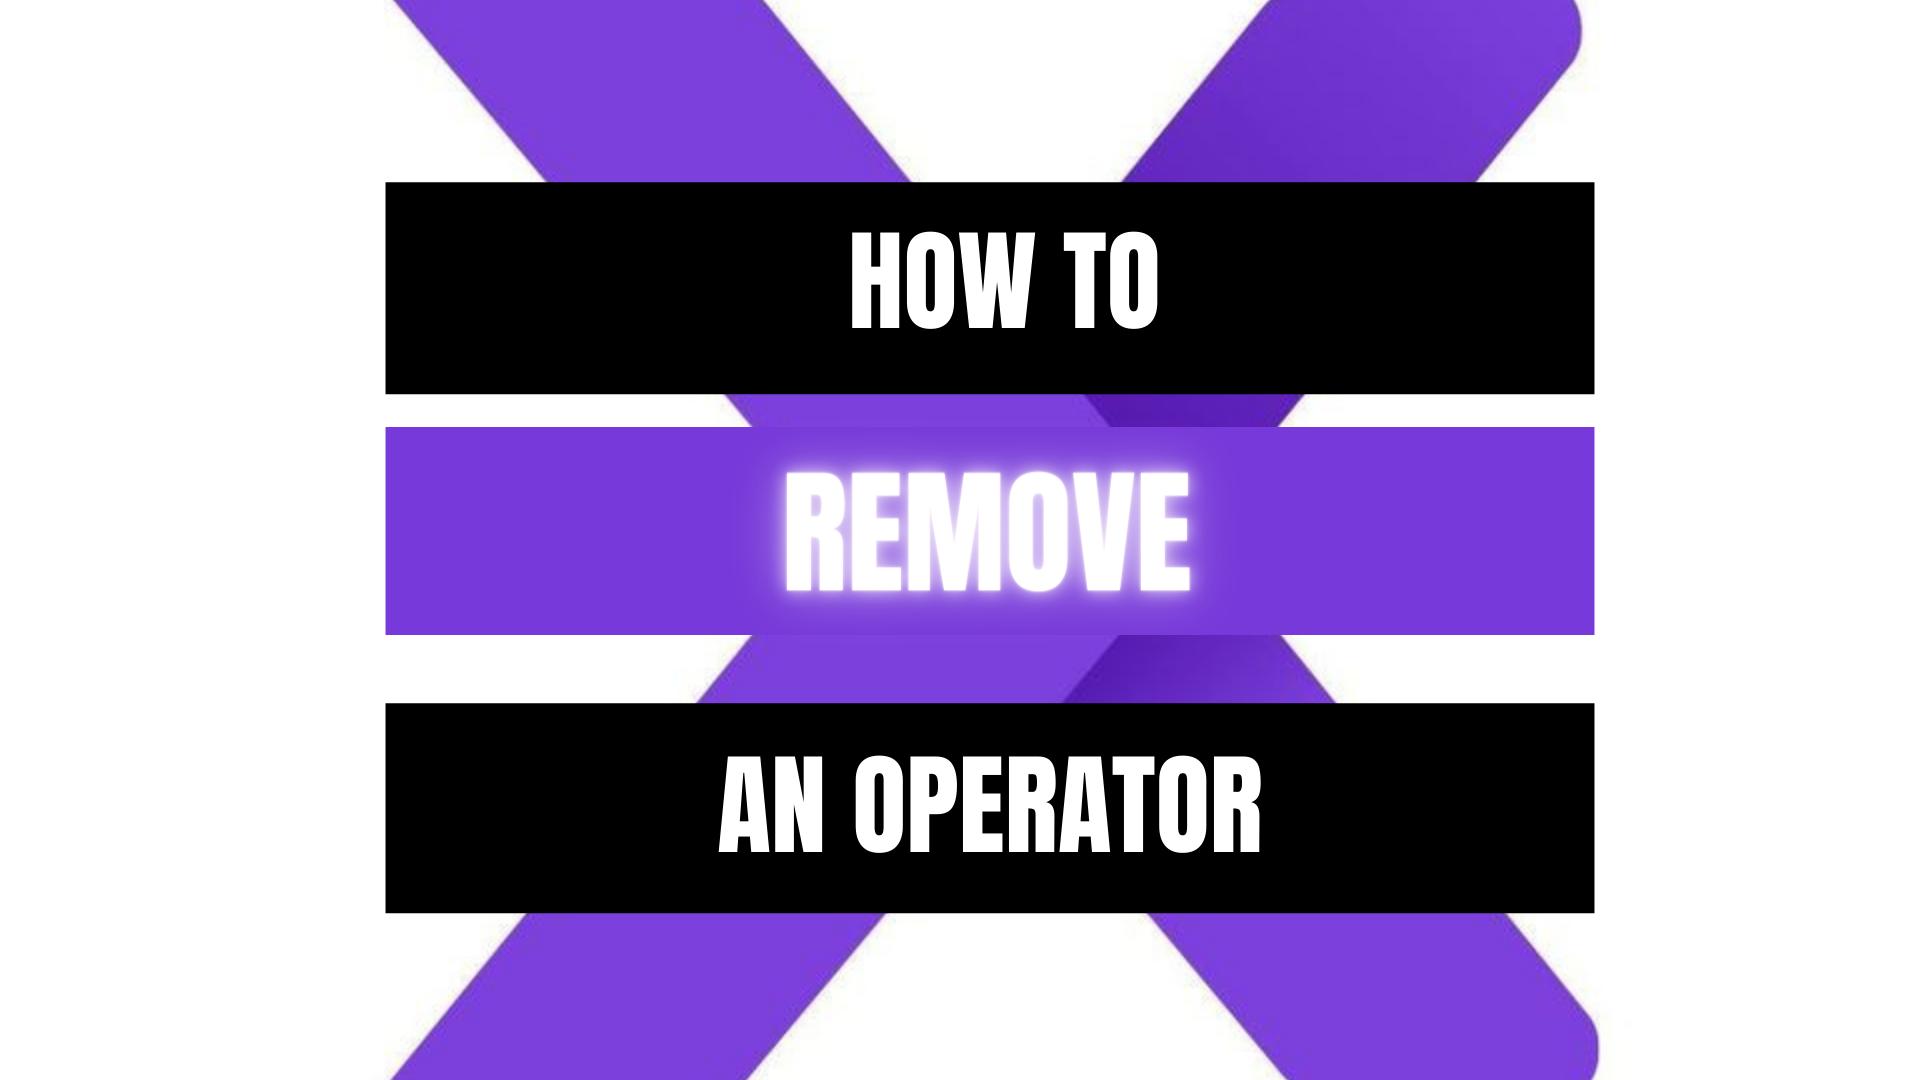 Peekaboox - Remove an operator